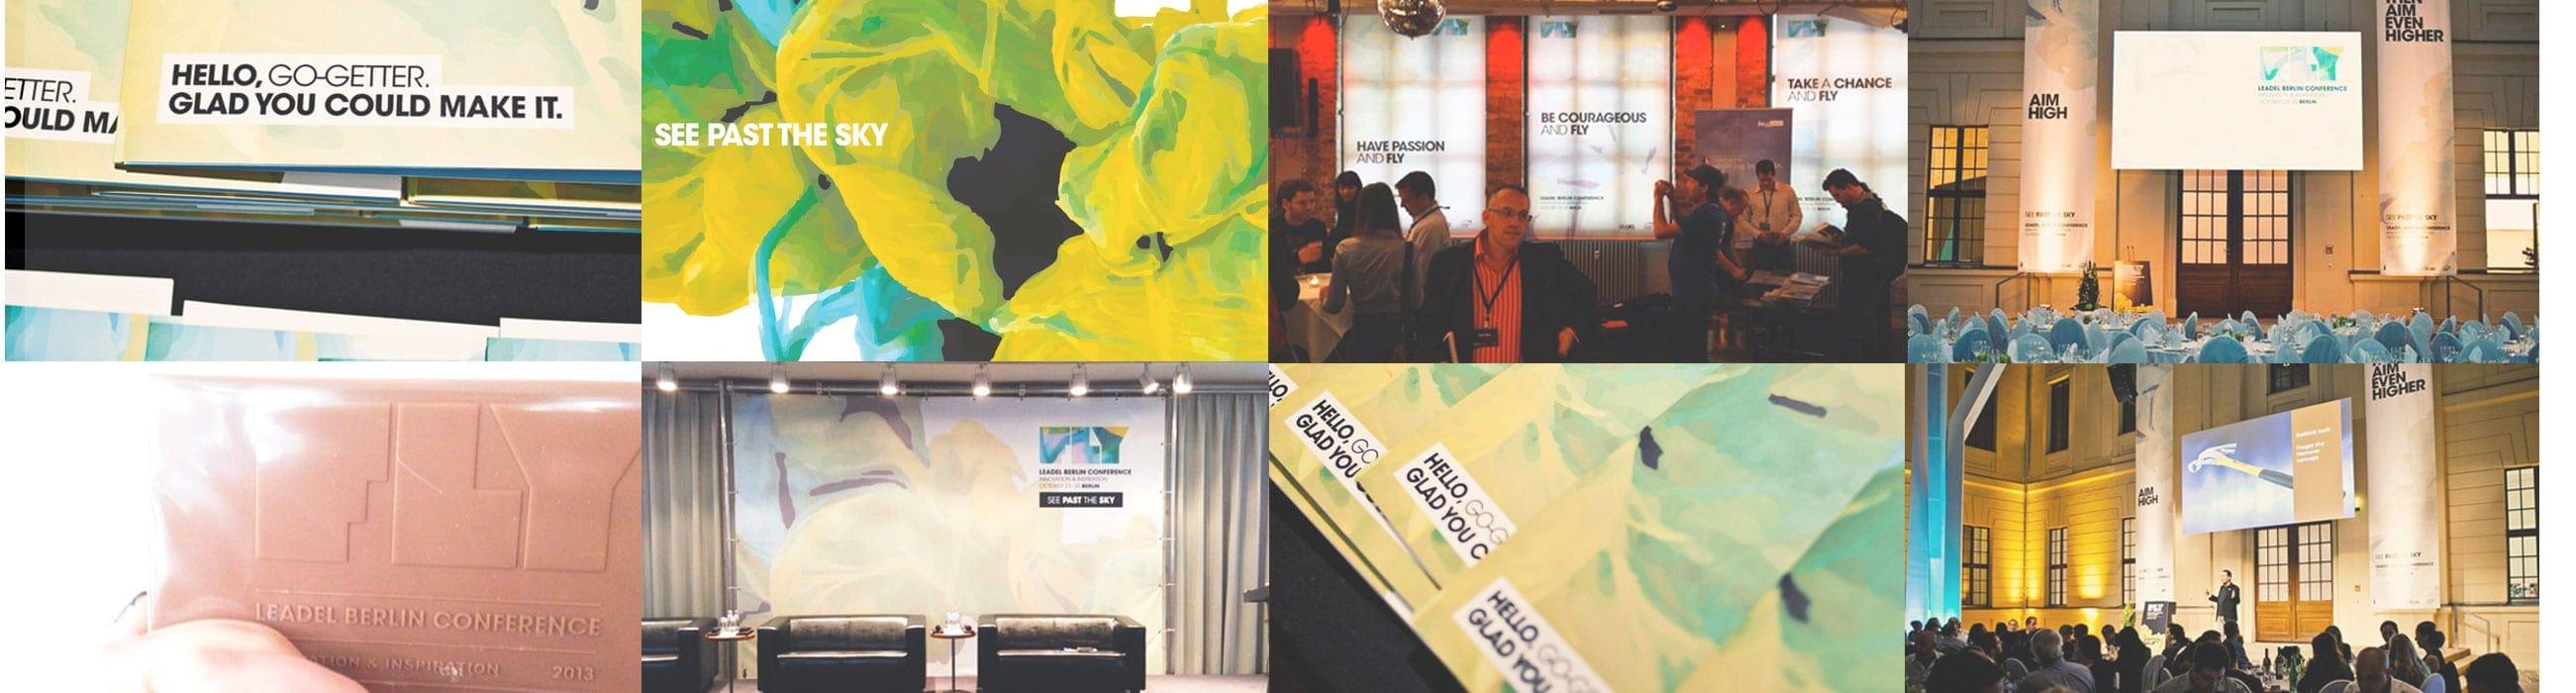 Fly Berlin Conference - natie-fly-event-photos-02 - Natie Branding Agency